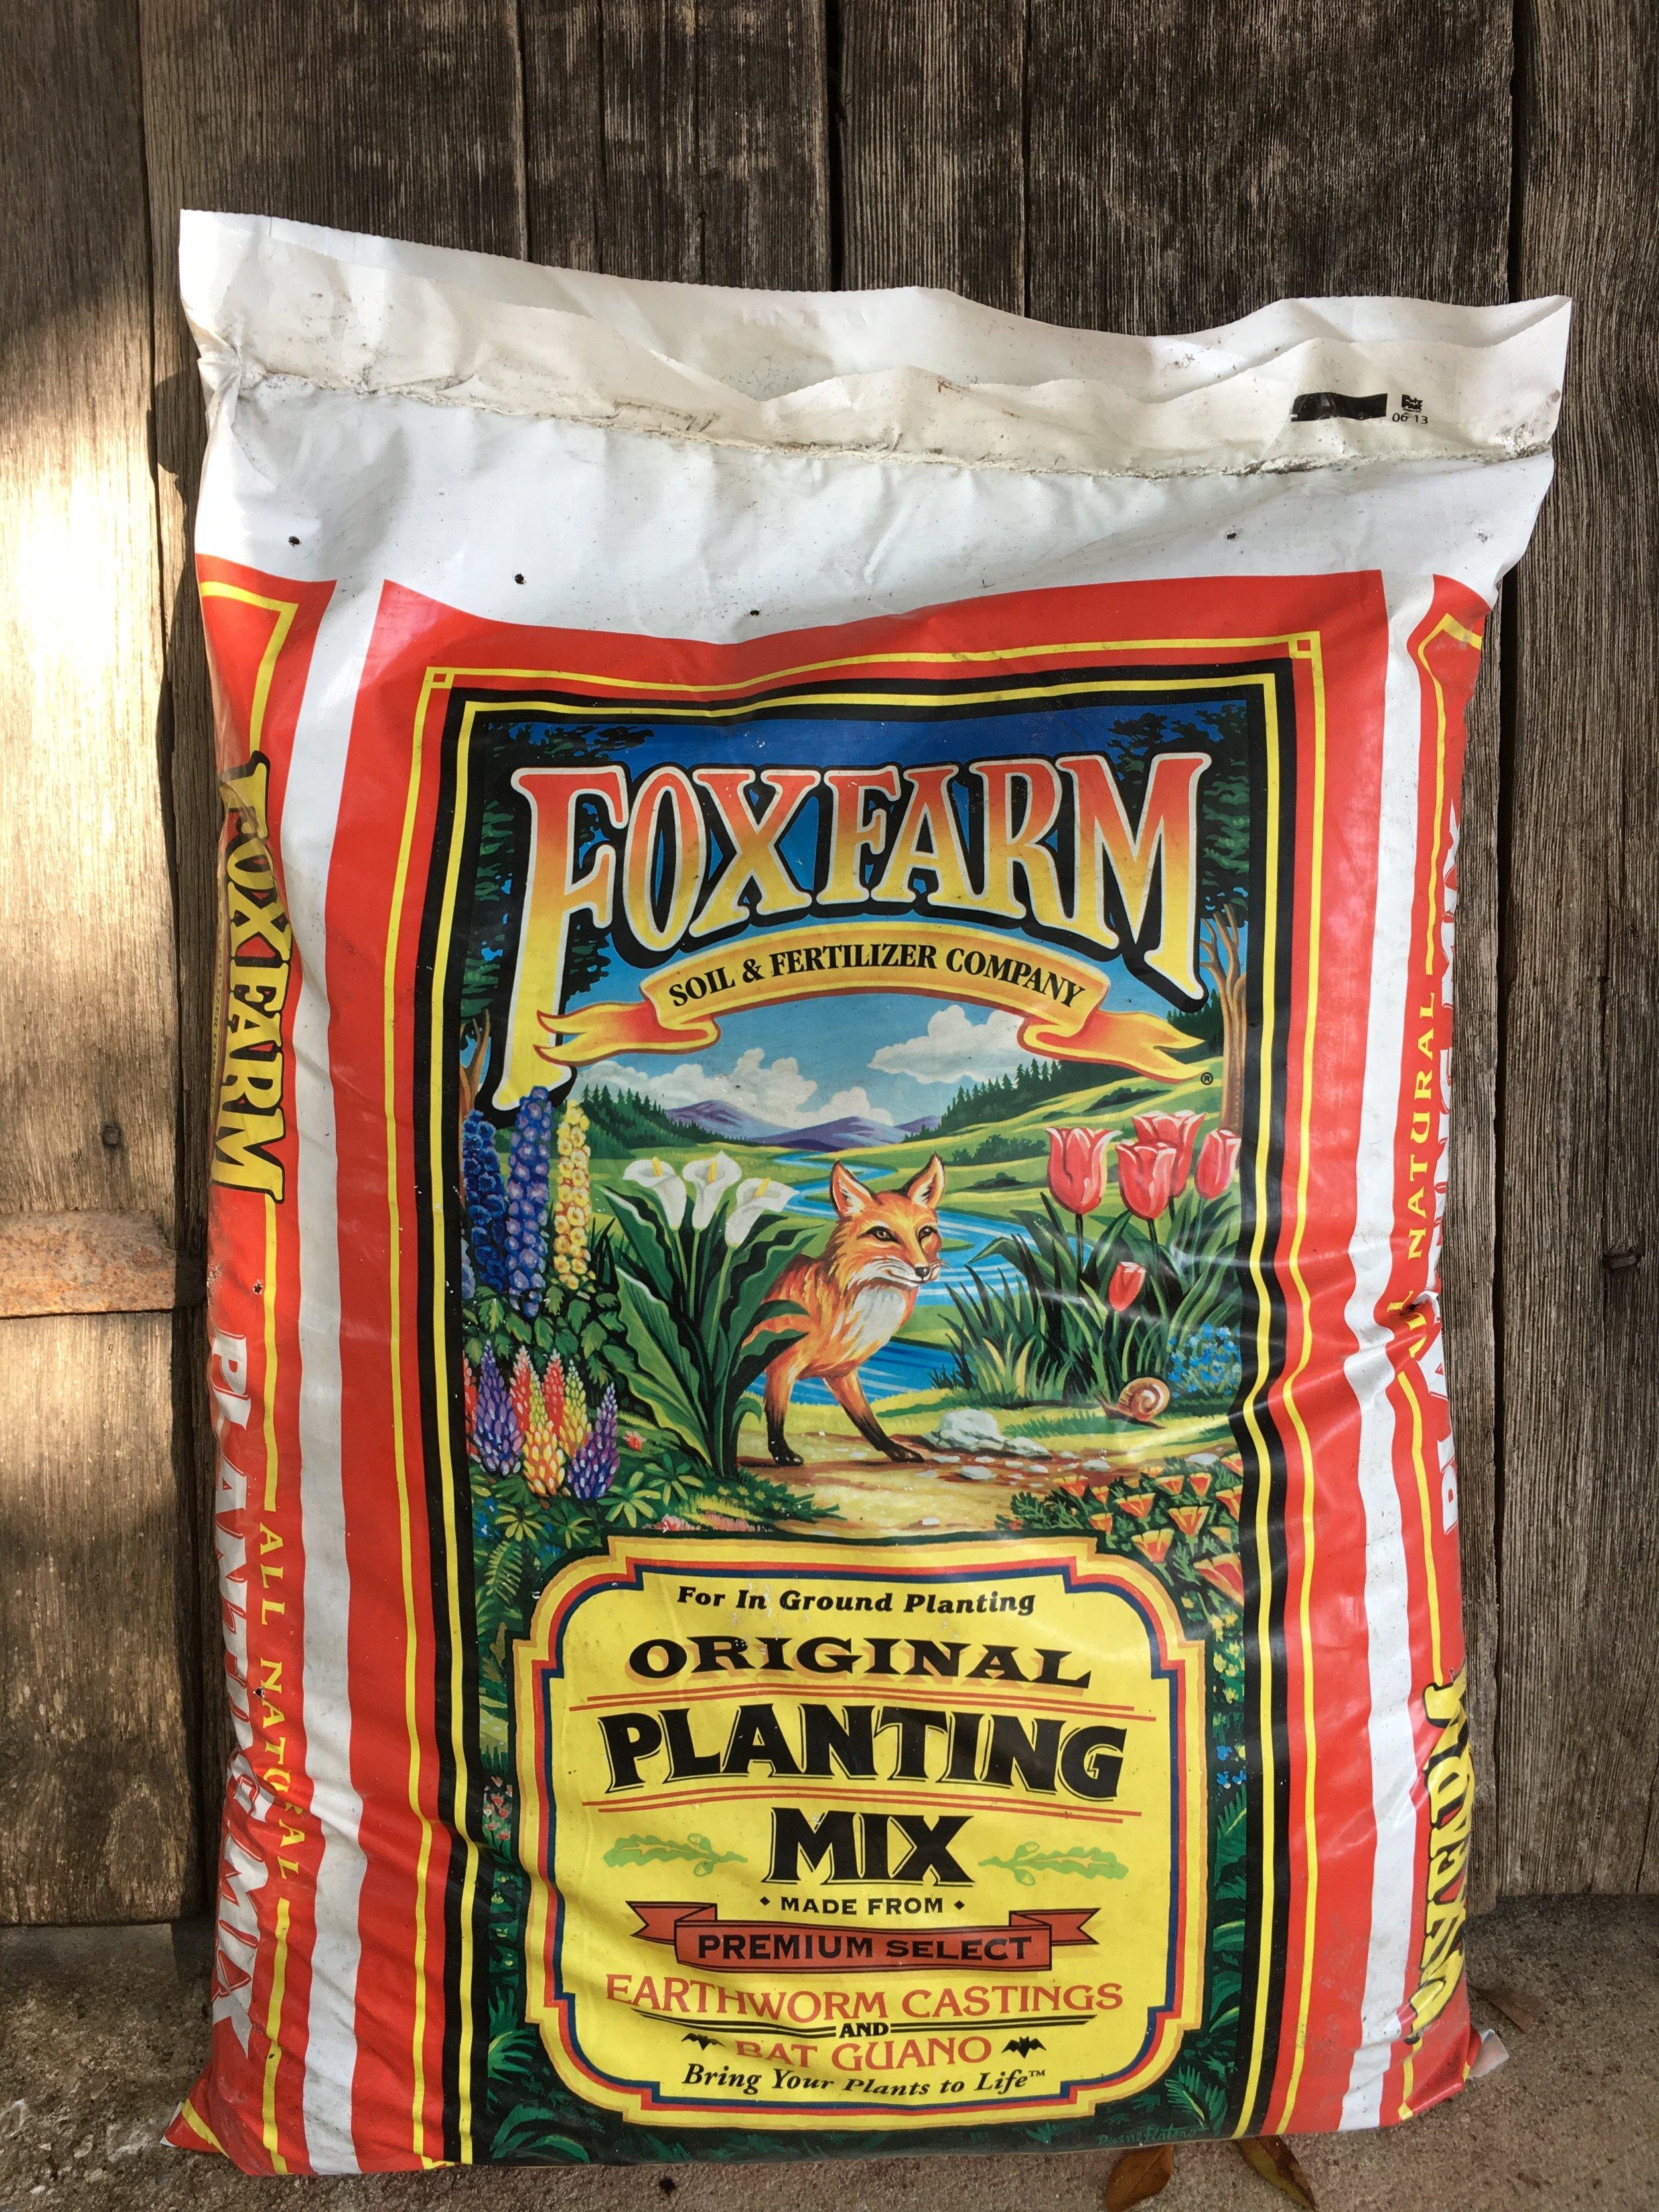 Fox Farm Original Planting Mix.jpg